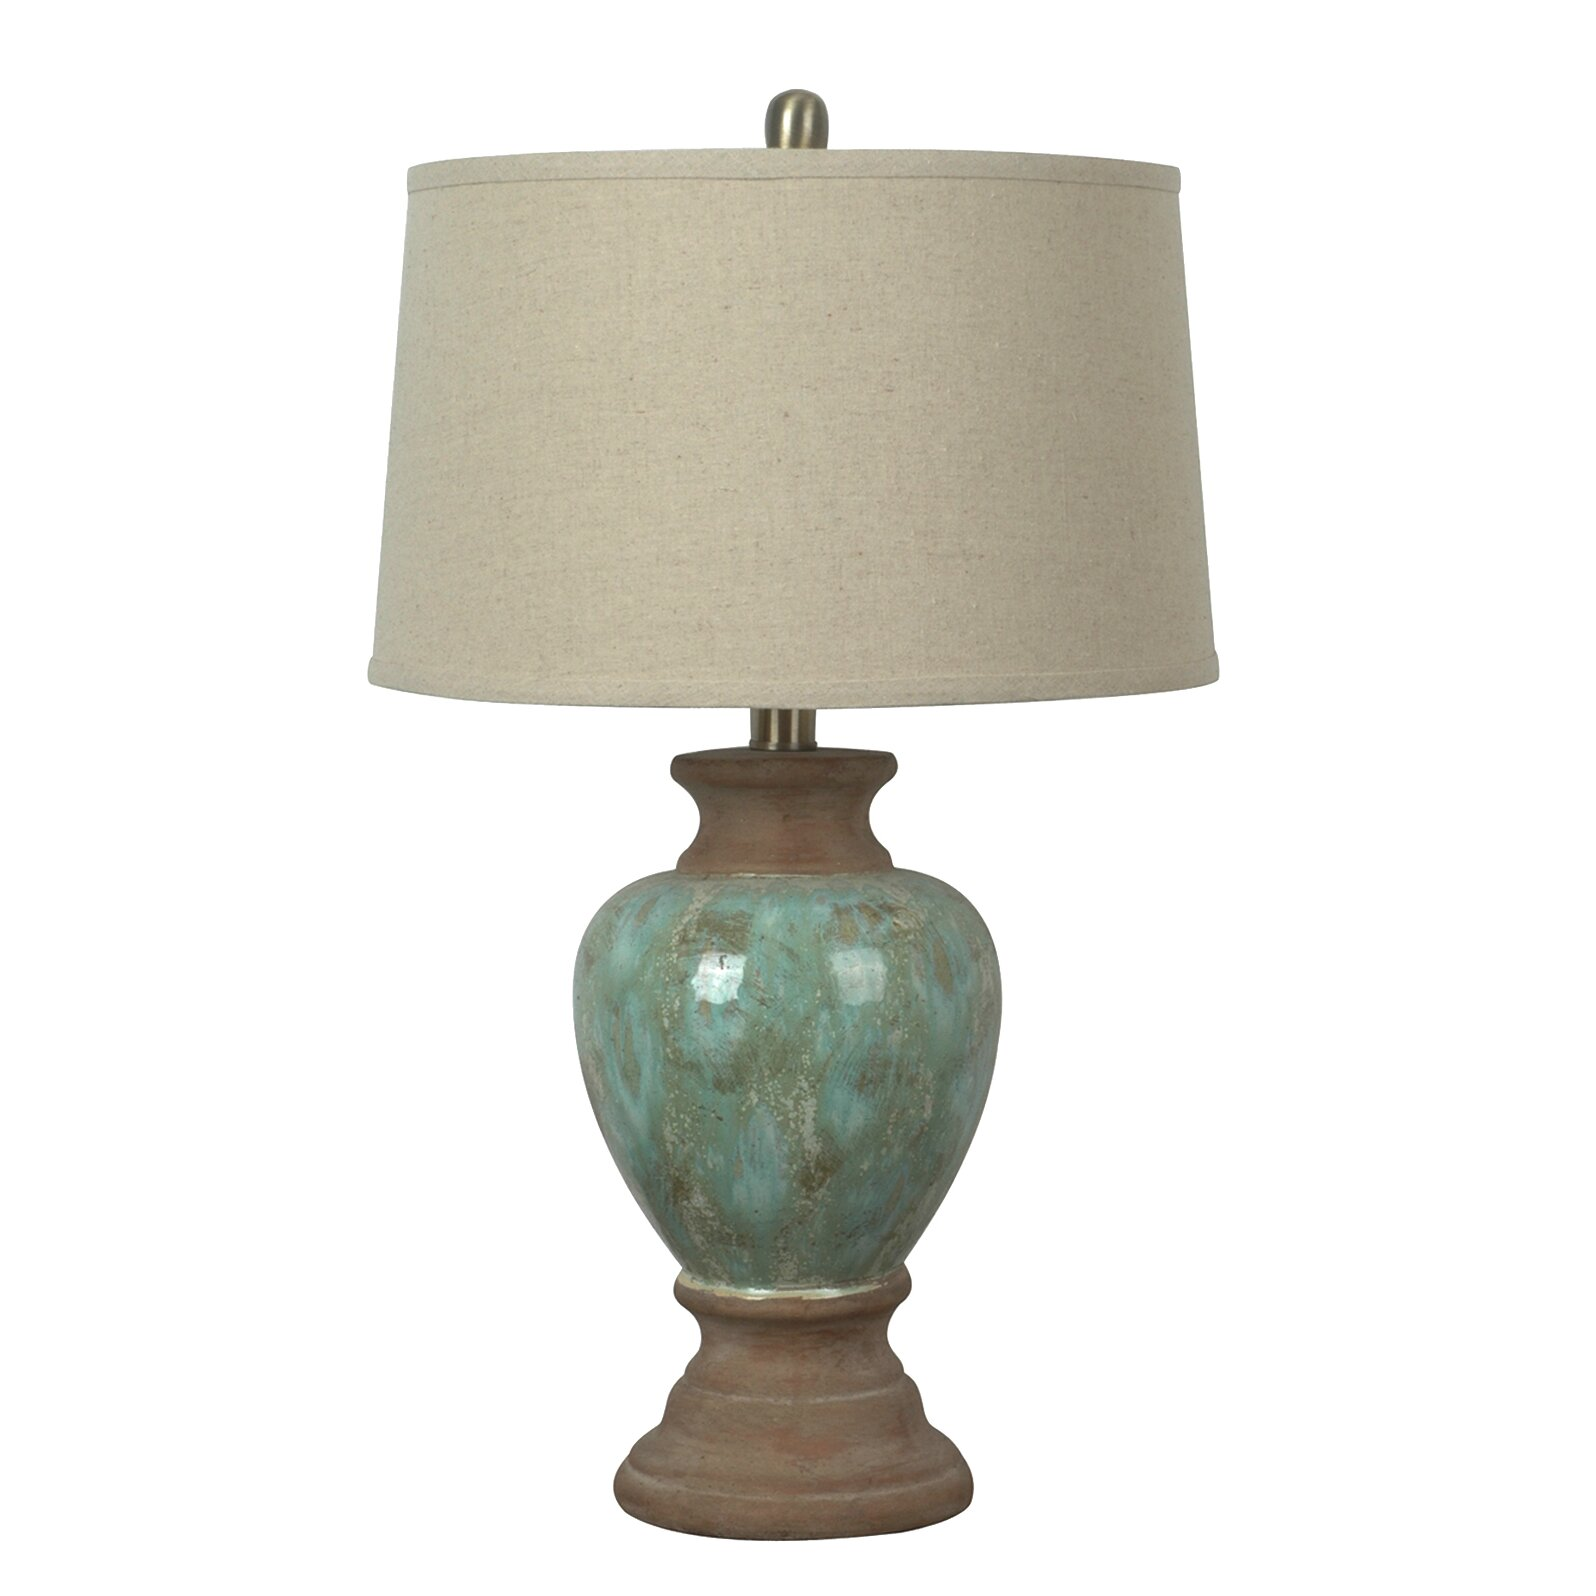 crestview leona table lamp reviews wayfair. Black Bedroom Furniture Sets. Home Design Ideas